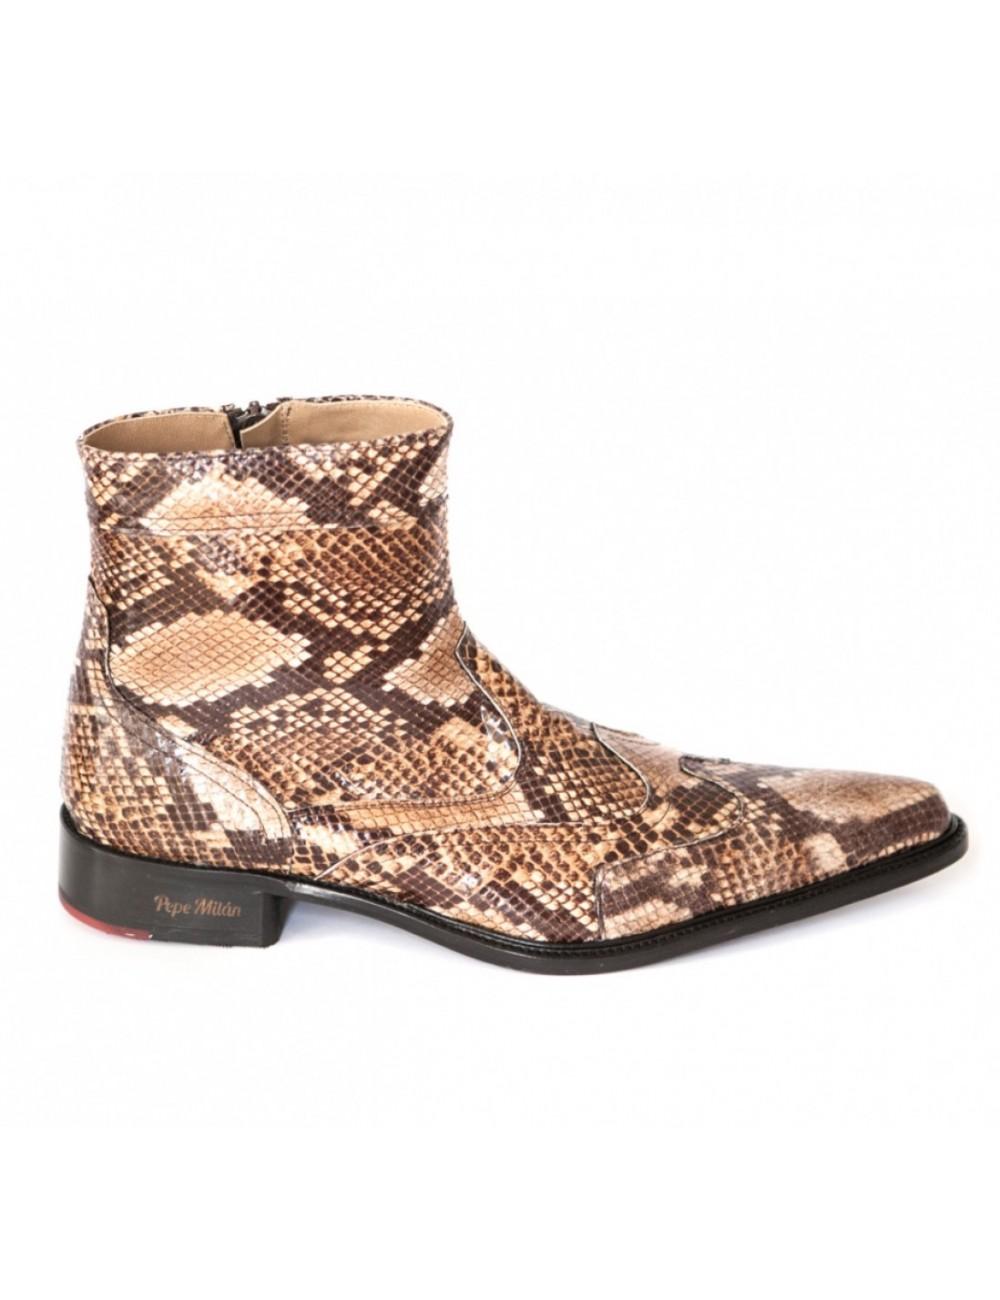 Boots homme cuir serpent camel - Bottines hommes artisanales